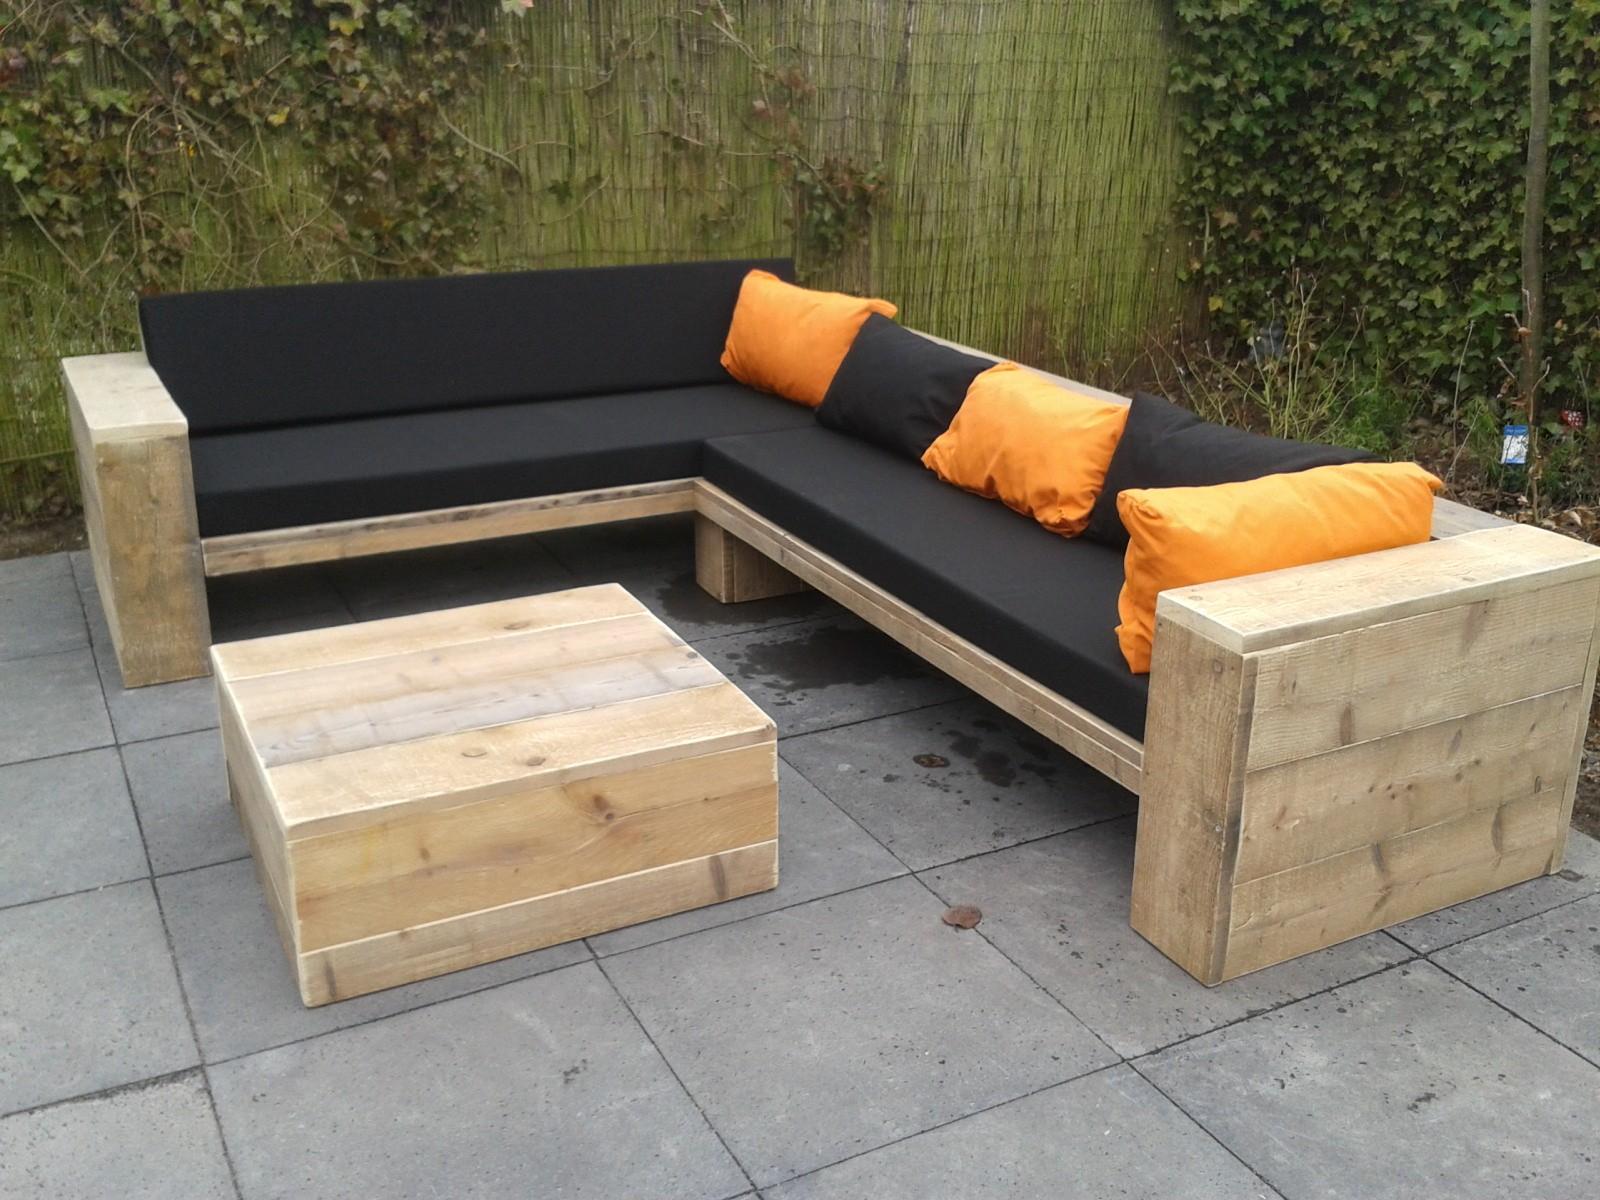 Lounge Kussens Buiten : Buiten hoekbank. latest lounge hoekbank tuin elegant hoekbank tuin